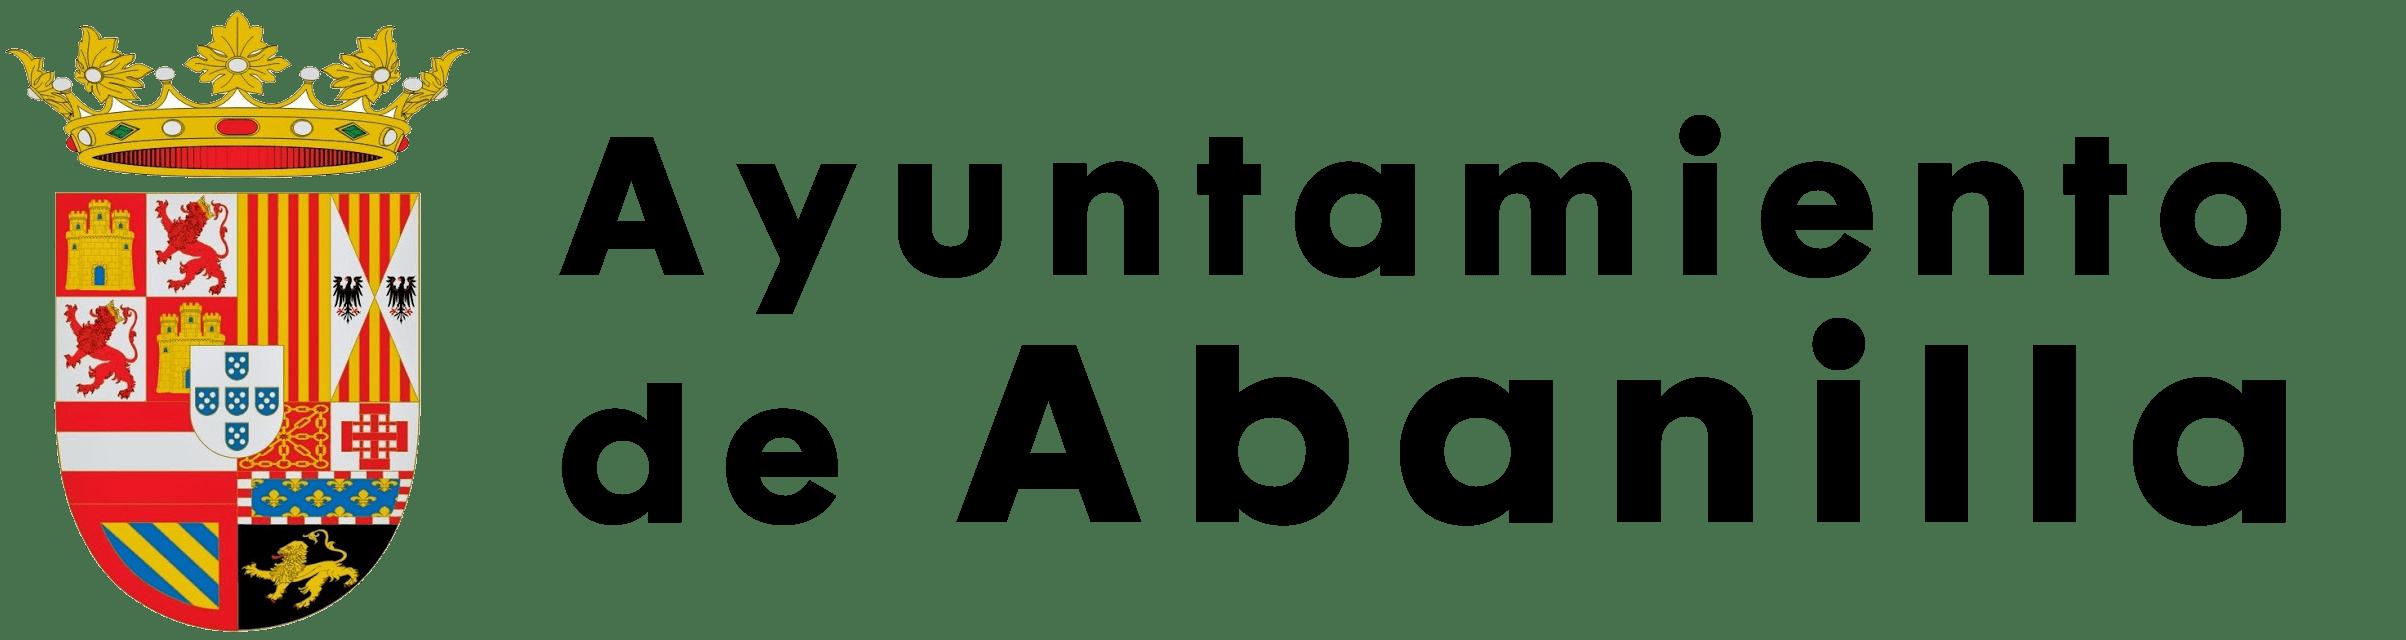 Logo AytoAbanilla negro